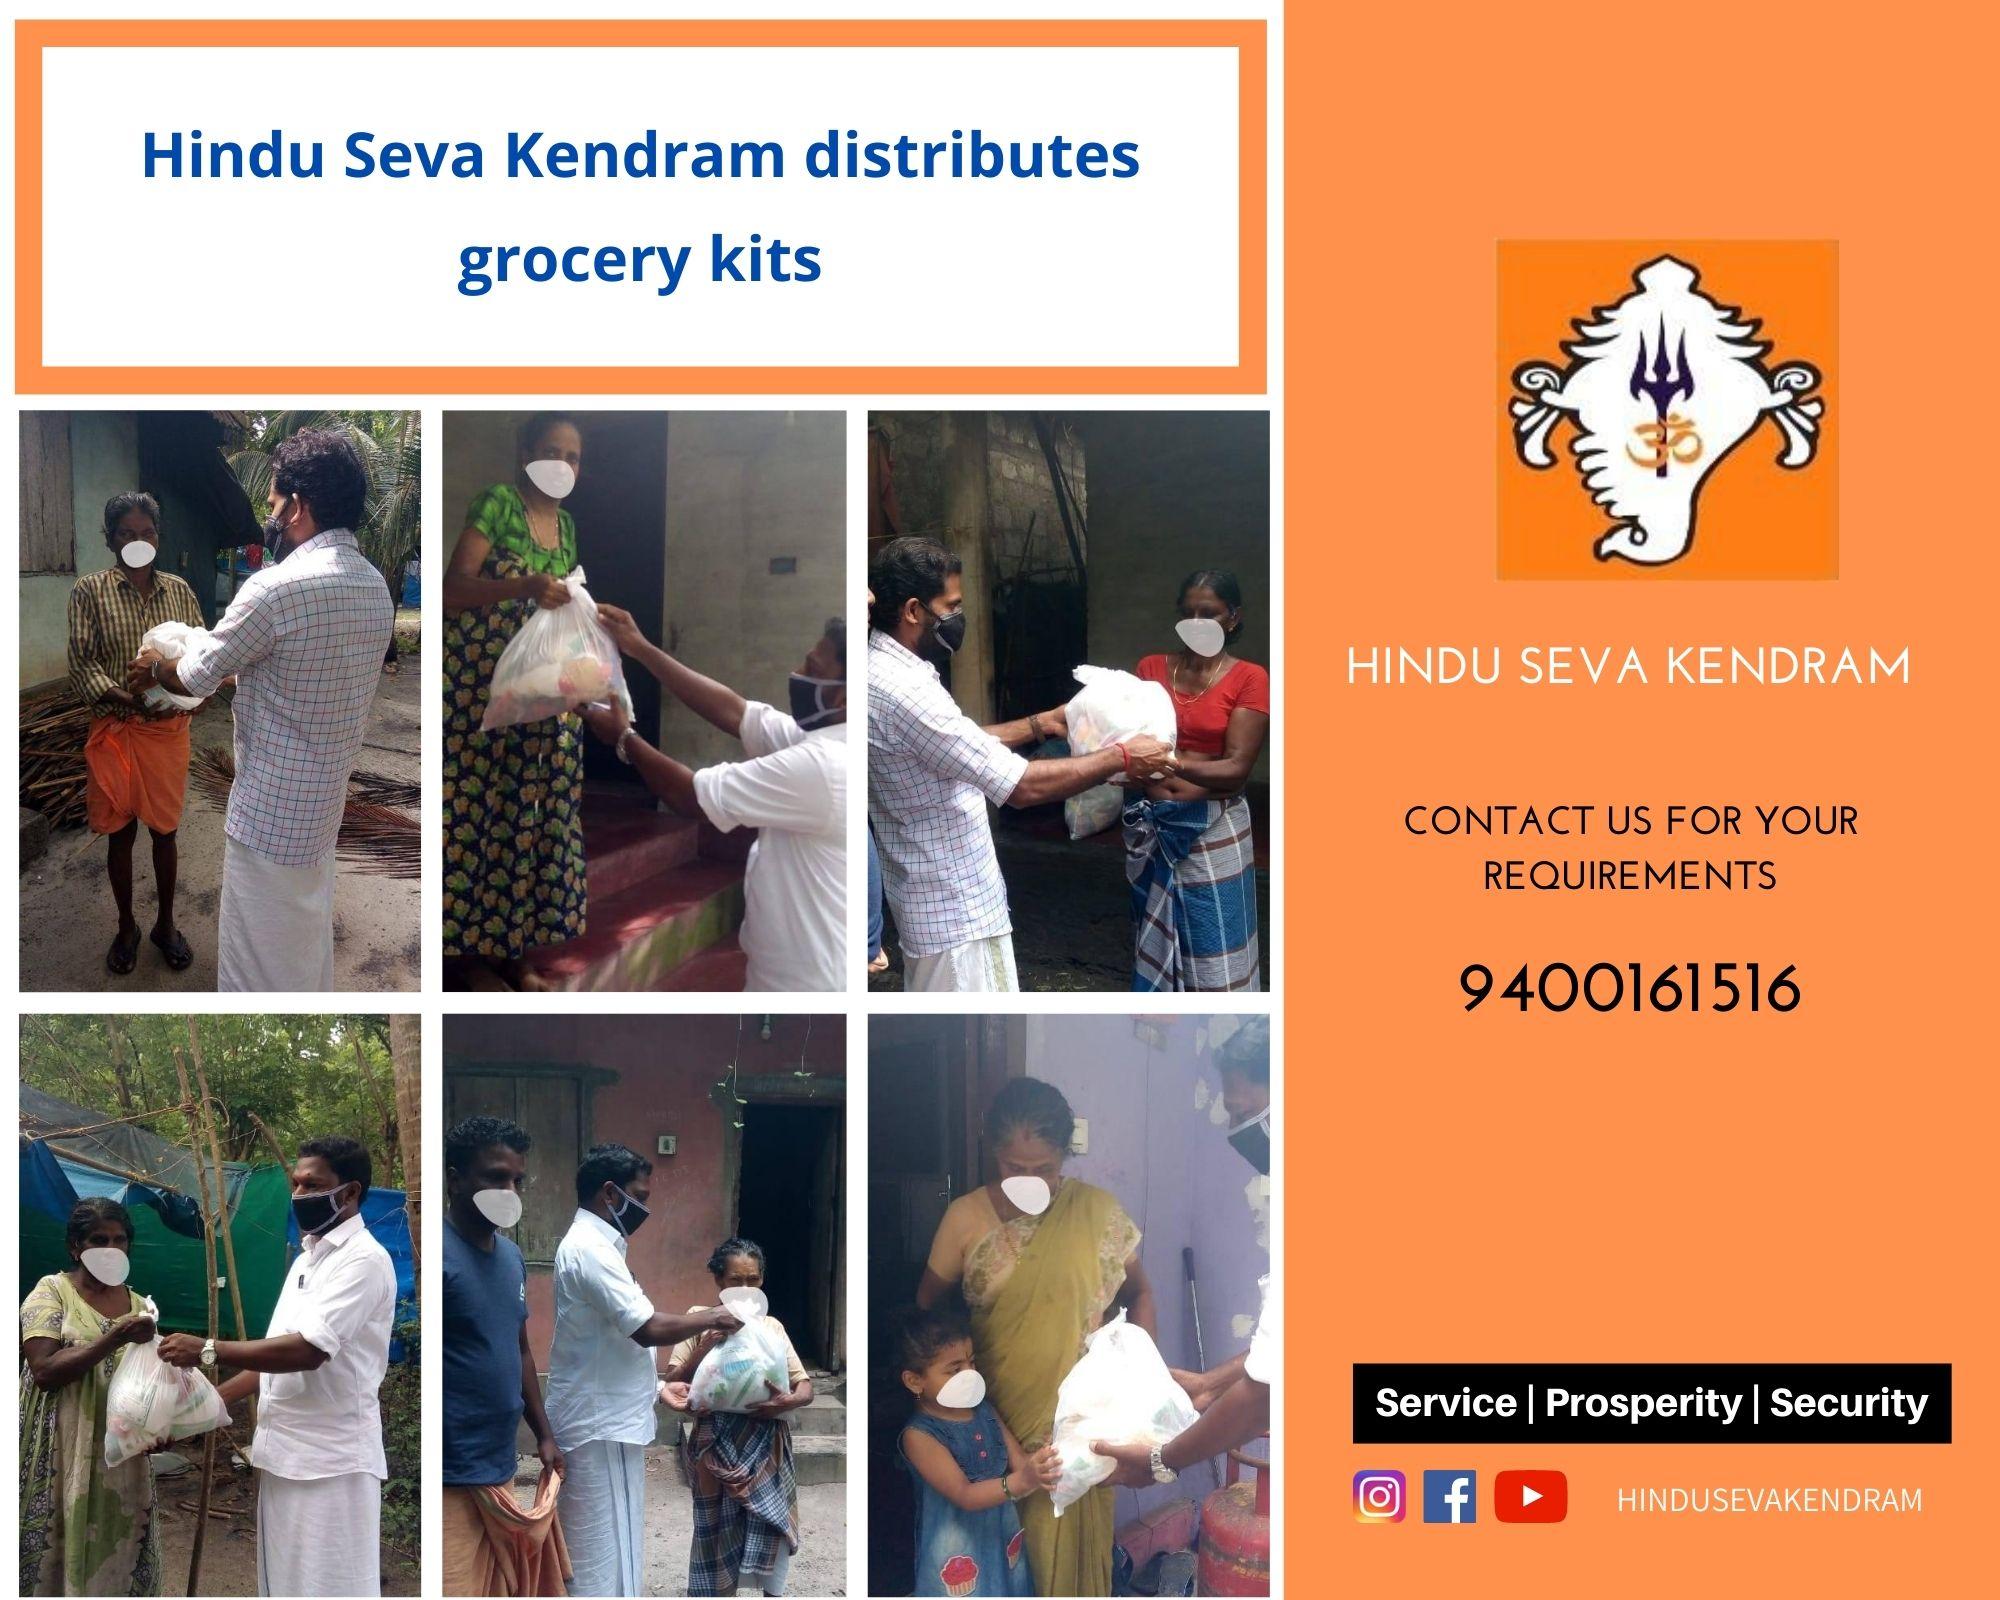 Hindu Seva Kendram distributes grocery kits in Alappuzha